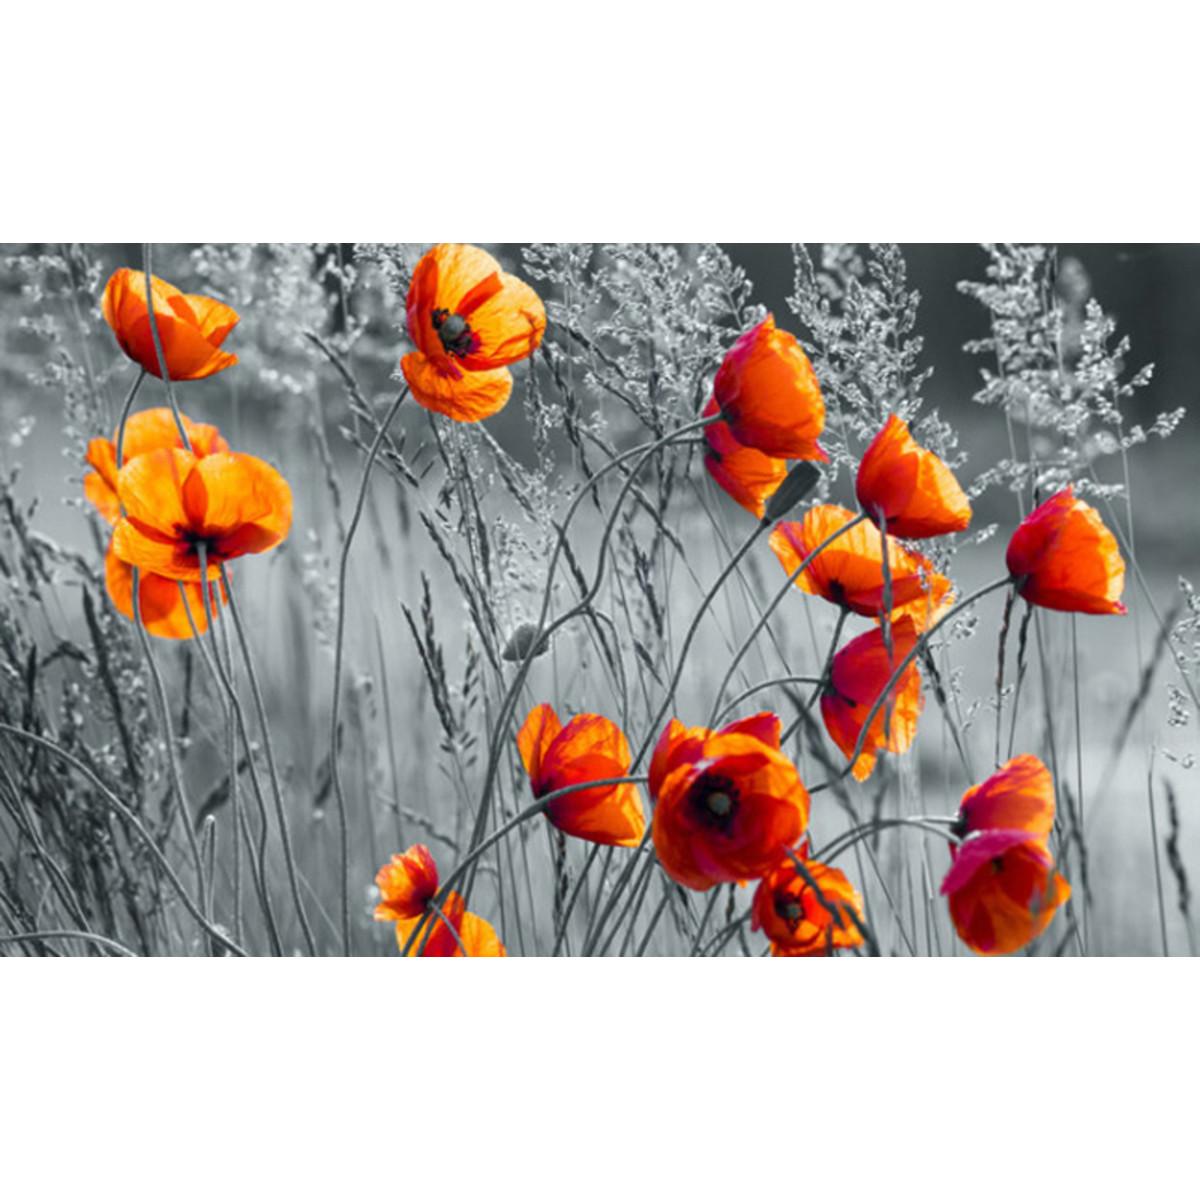 Фотообои For Wall Цветы 11746V8 368х254 см